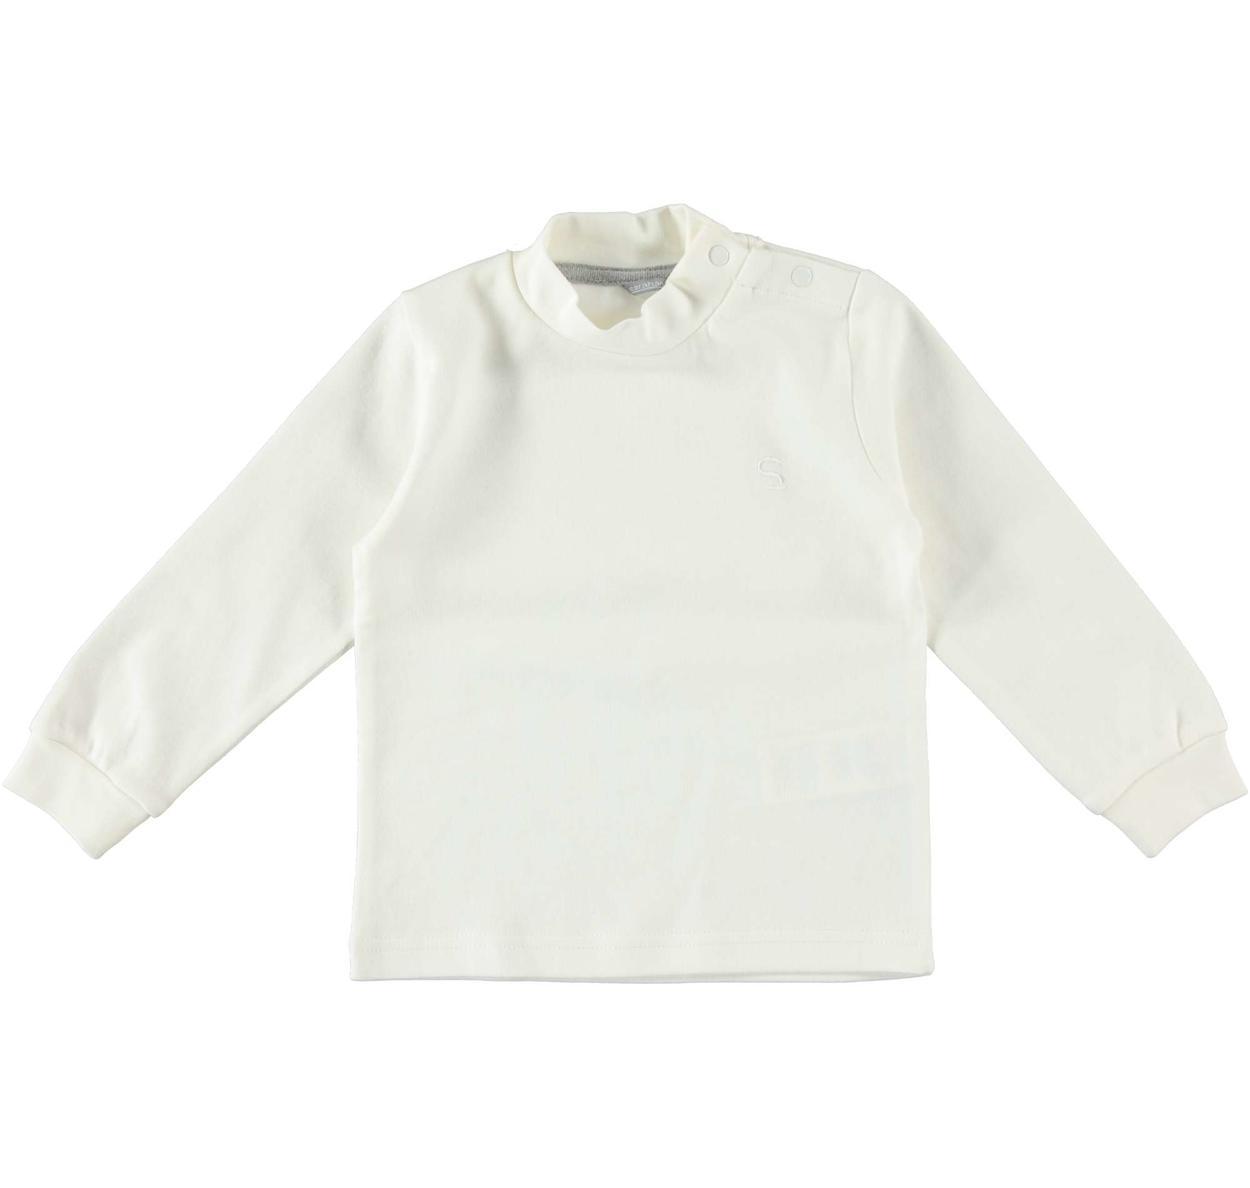 e8327740a8 Maglietta girocollo in tinta unita a manica lunga per bambino da 6 mesi a 7  anni Sarabanda